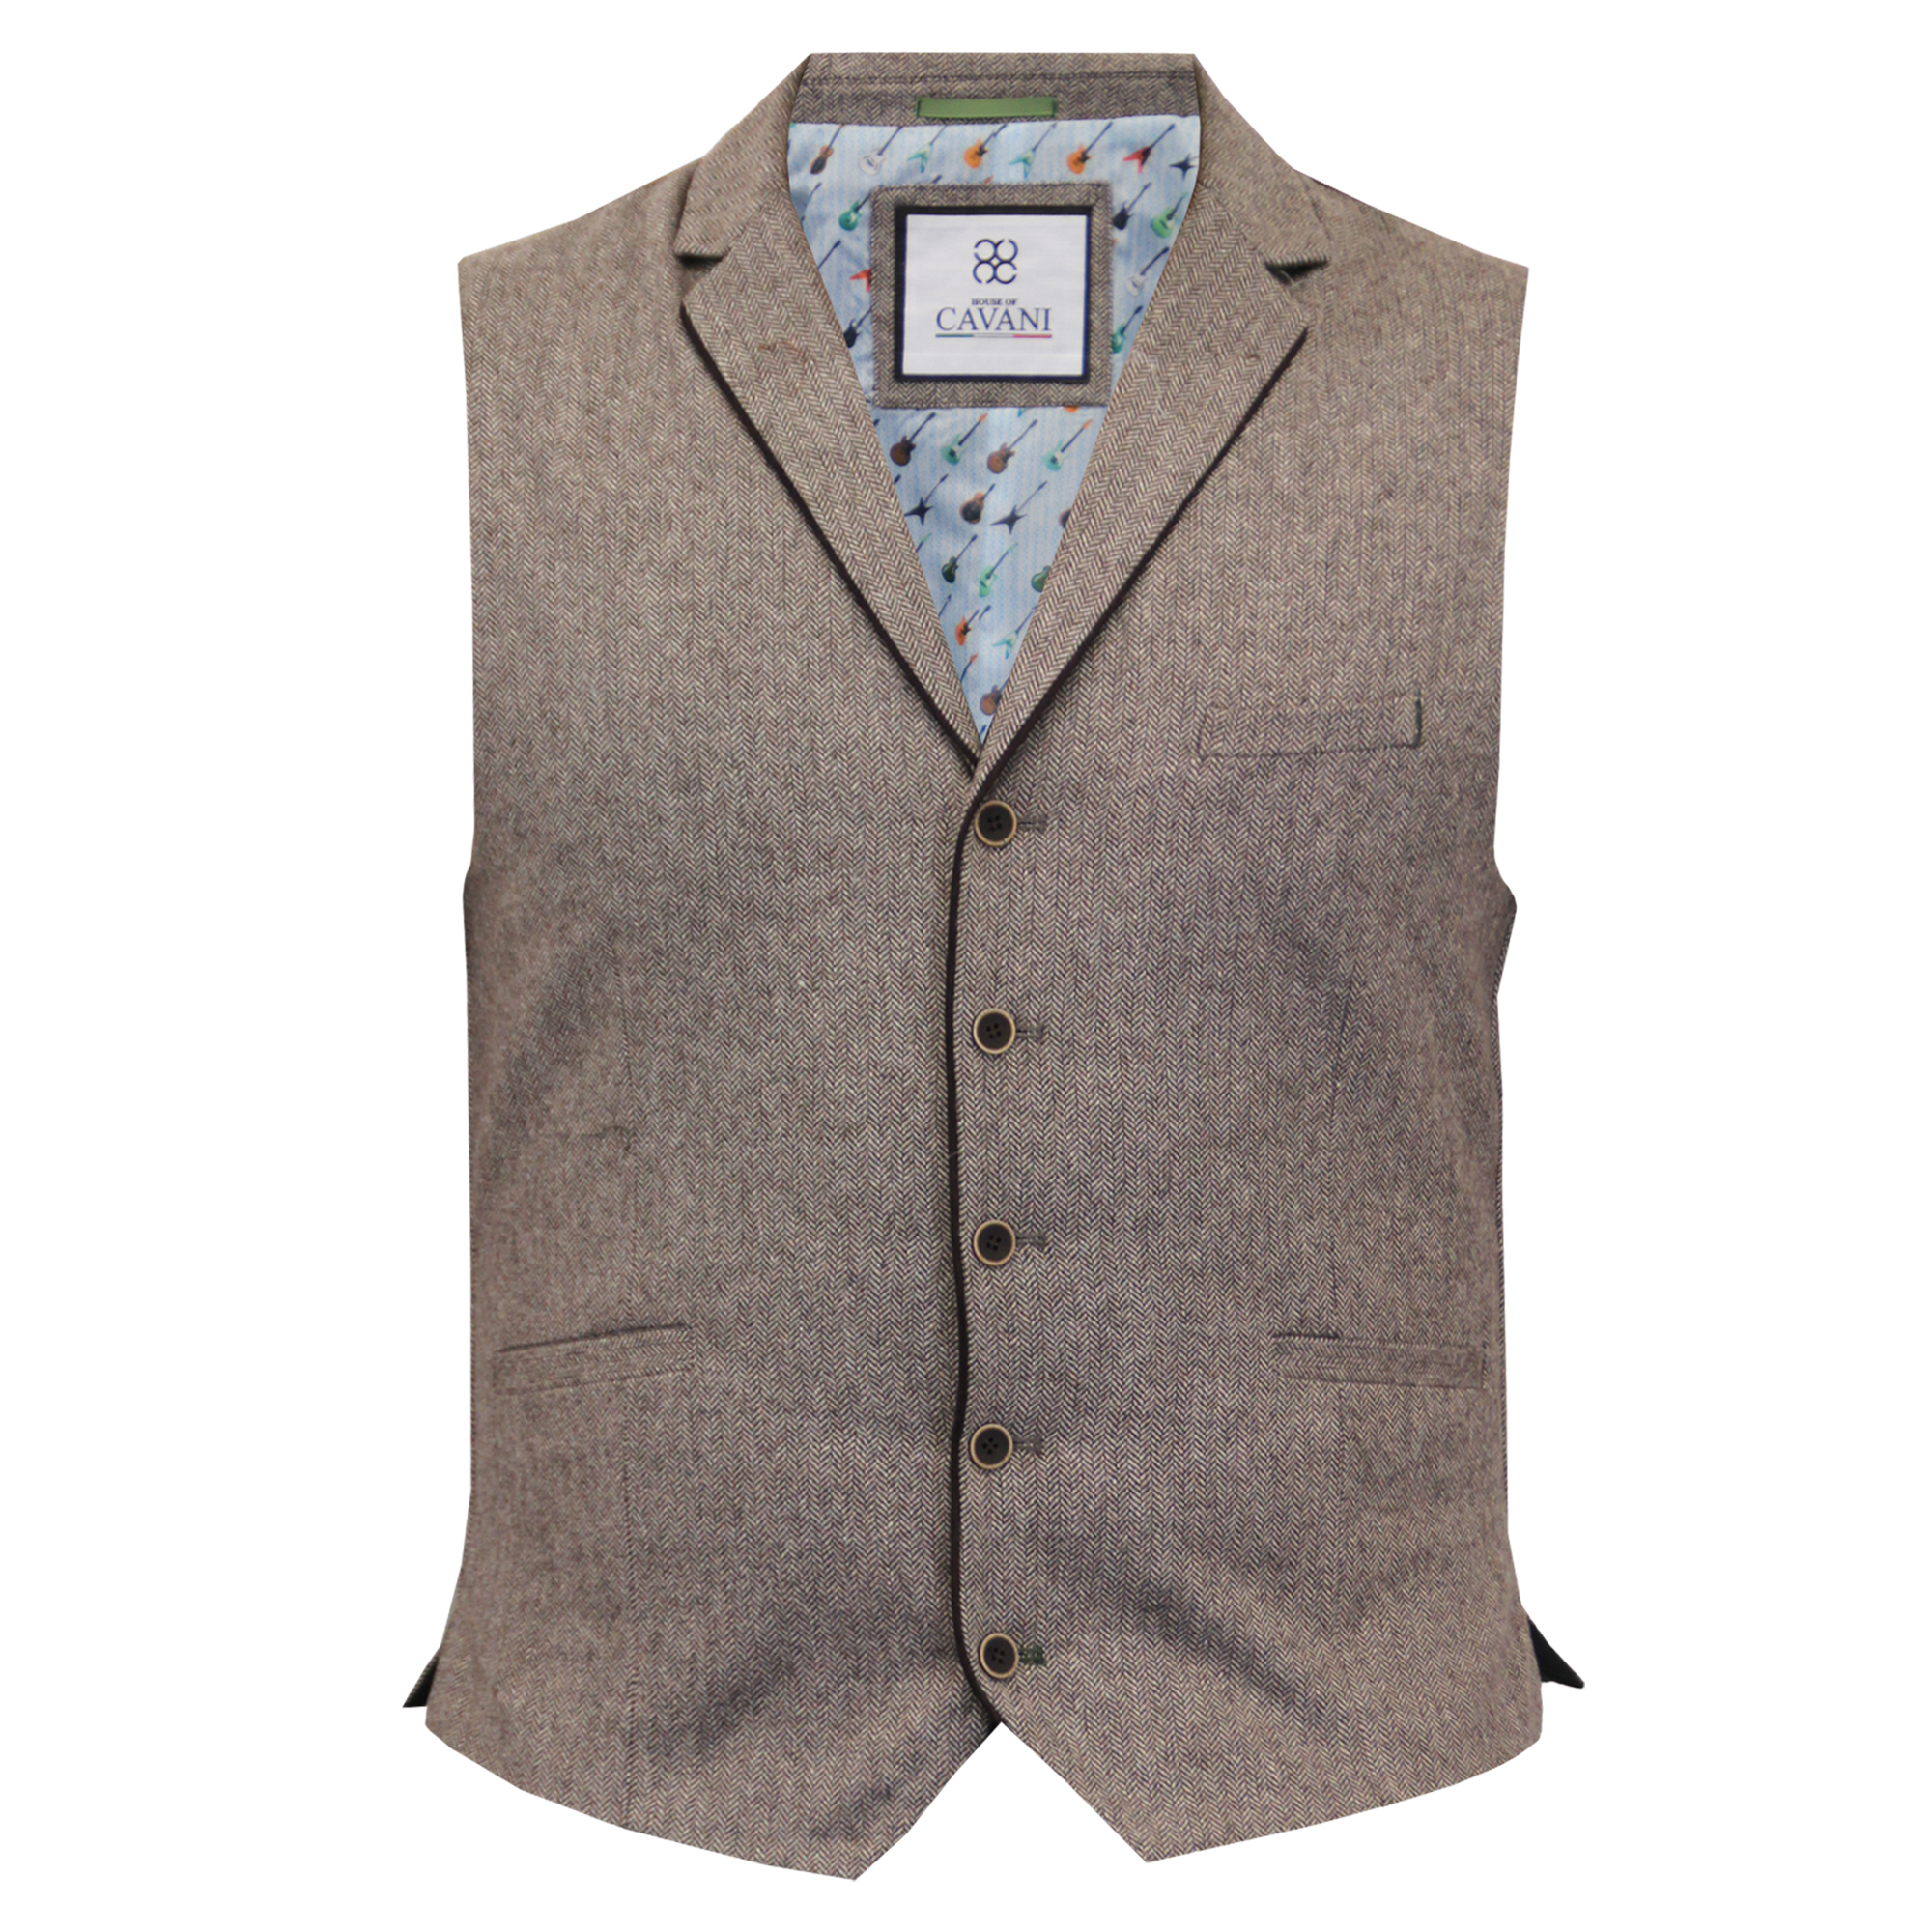 Mens-Waistcoat-Wool-Mix-Cavani-Formal-Vest-Herringbone-Tweed-Check-Party-Smart thumbnail 8